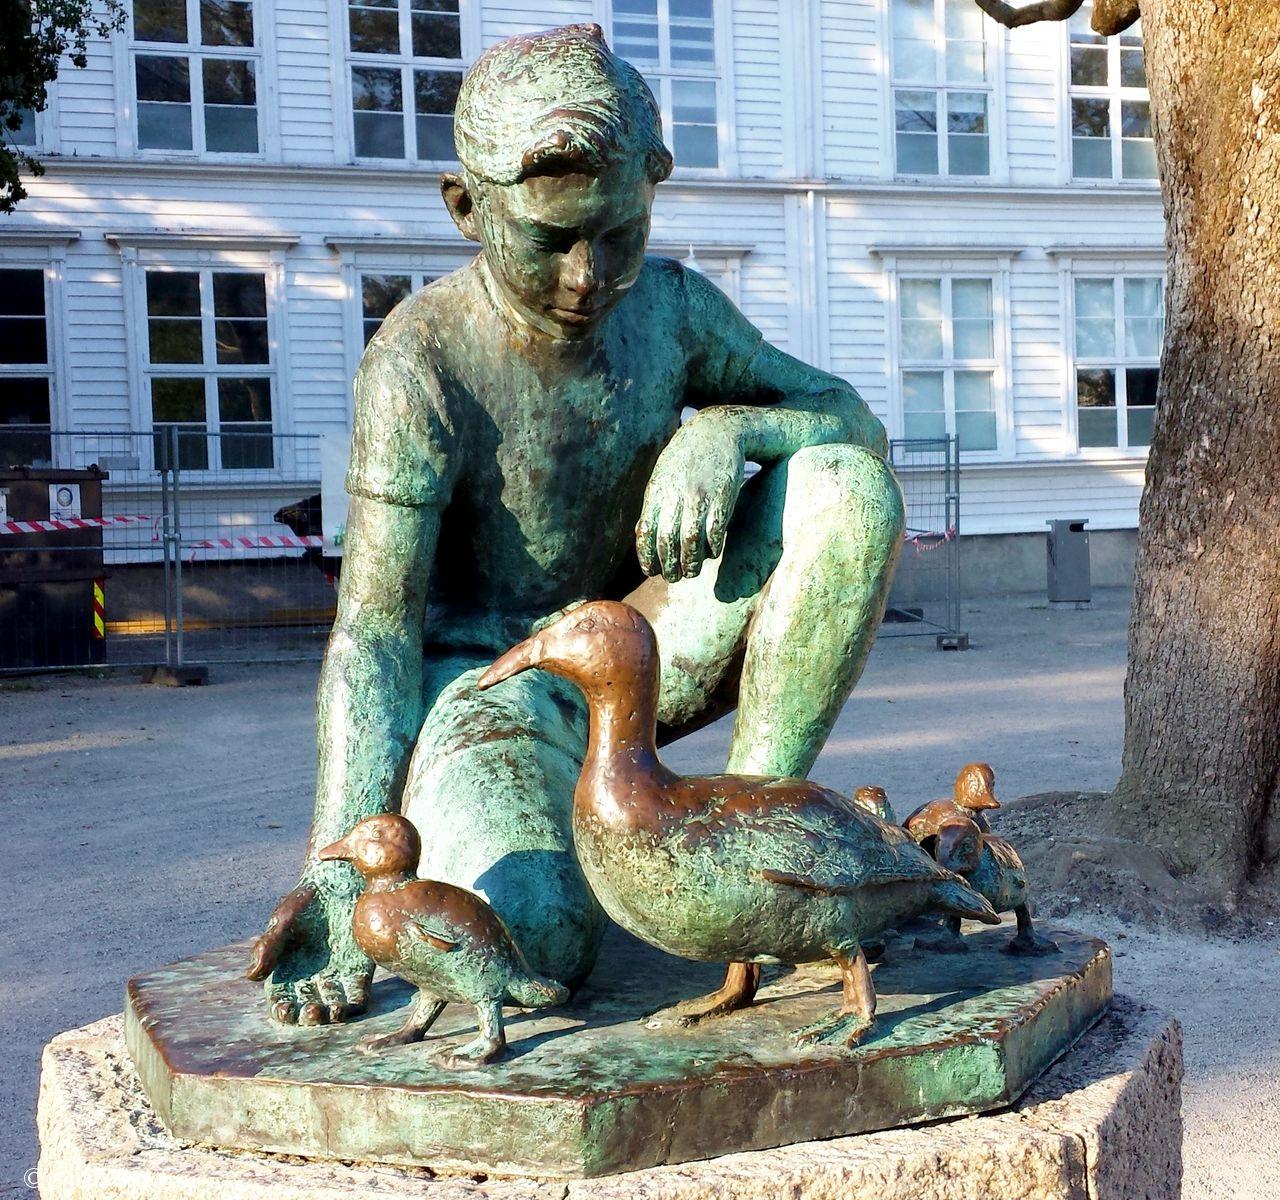 Norway - Rogaland - Stavanger - Statuen Andemor ved Breiavatnet